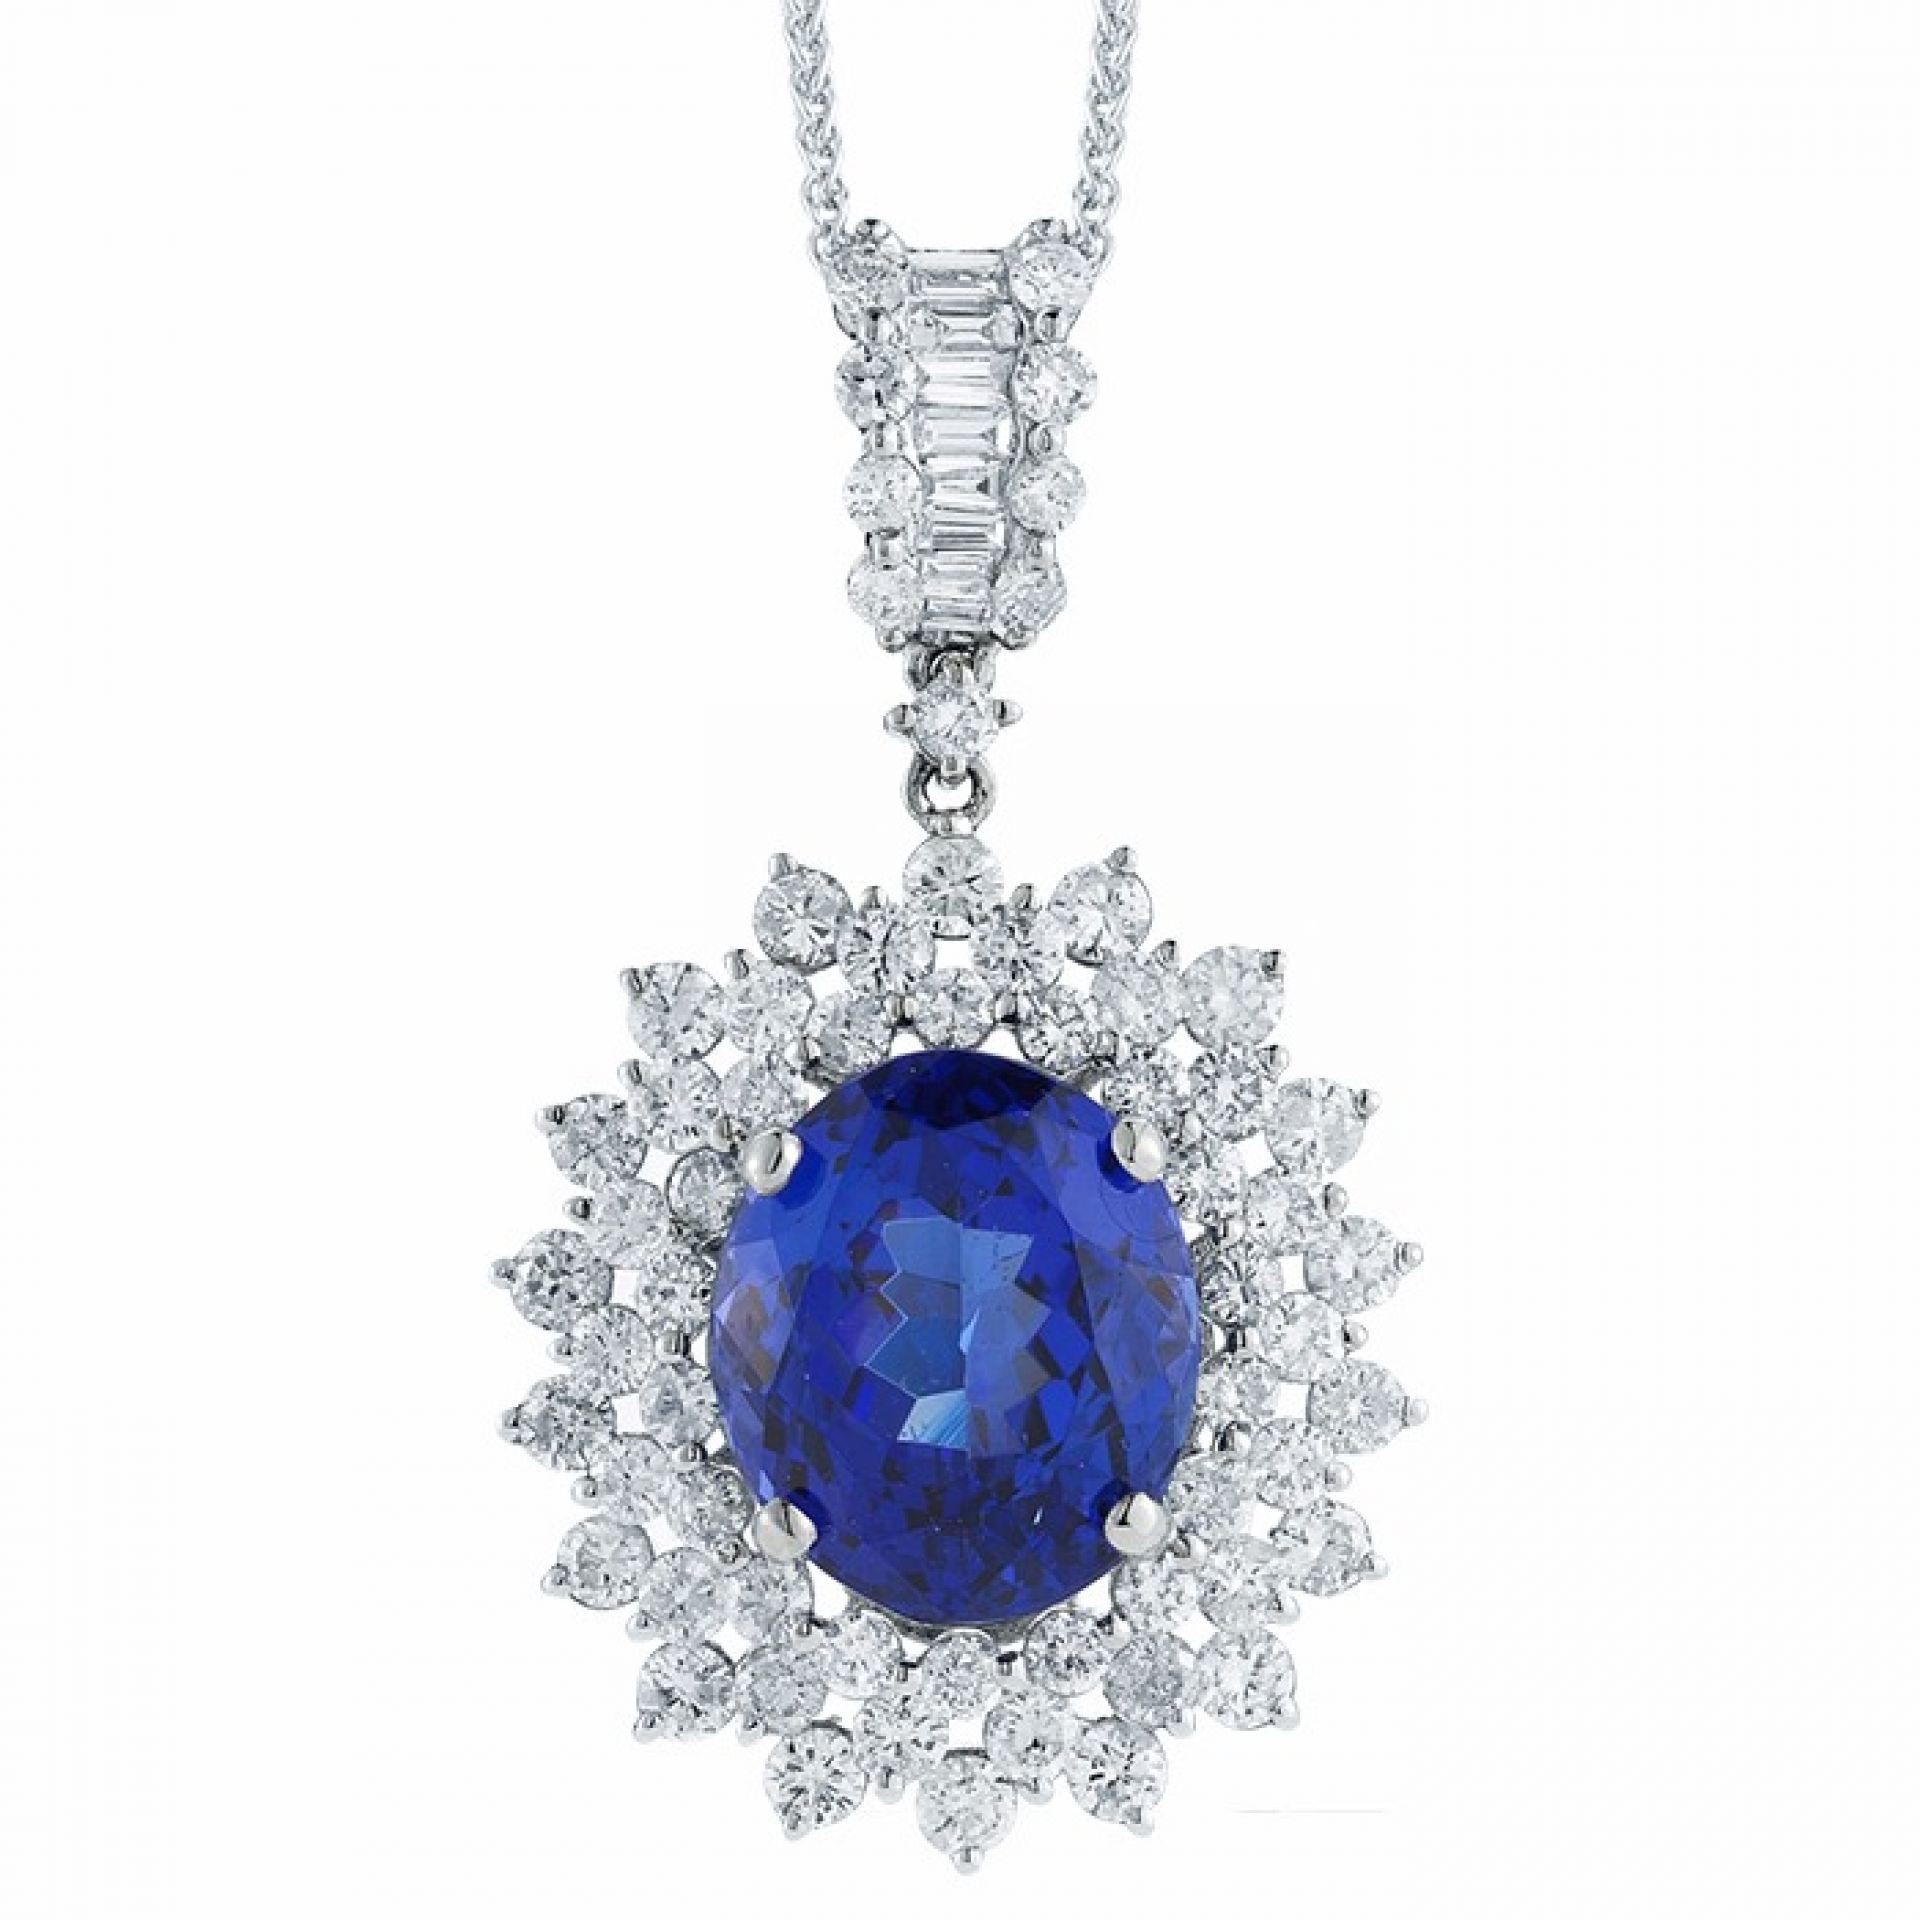 Oval Tanzanite and Diamond Pendant P105727-1W